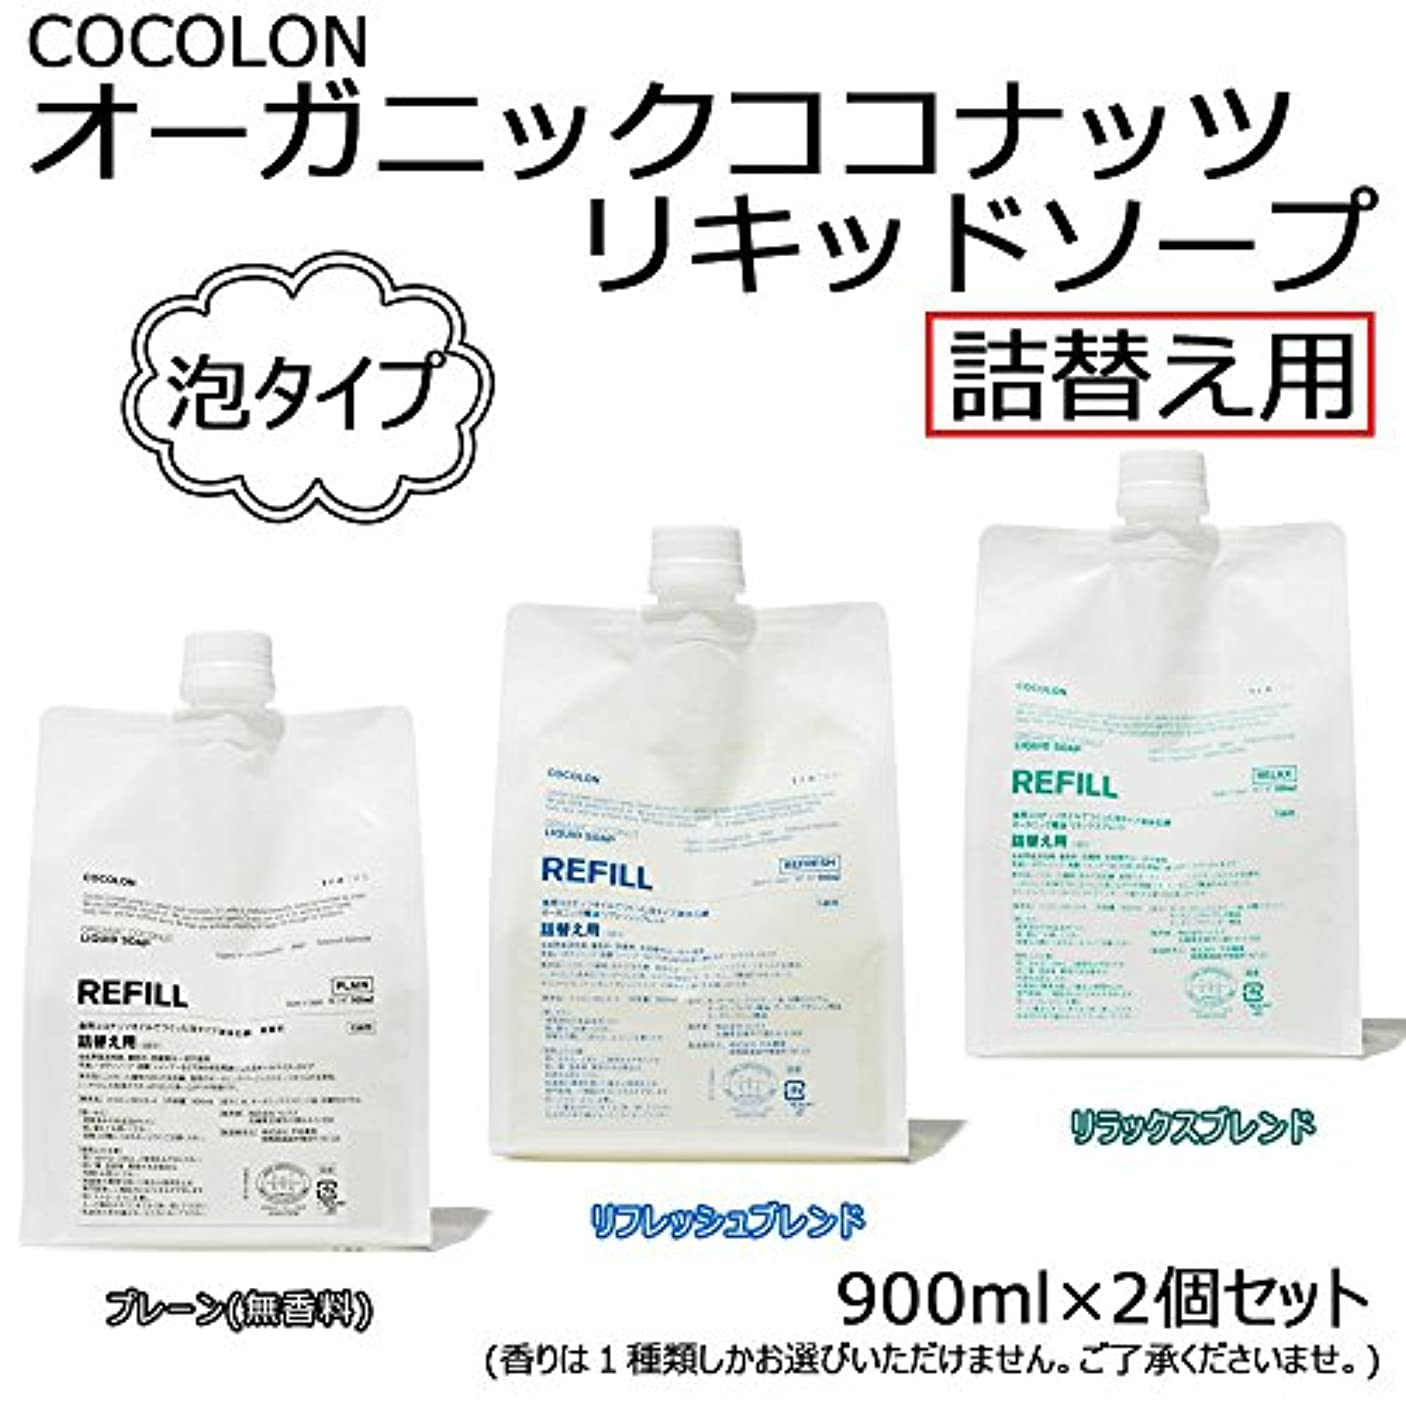 COCOLON ココロン オーガニックココナッツリキッドソープ 泡タイプ 詰替え用 900ml 2個セット プレーン(無香料)